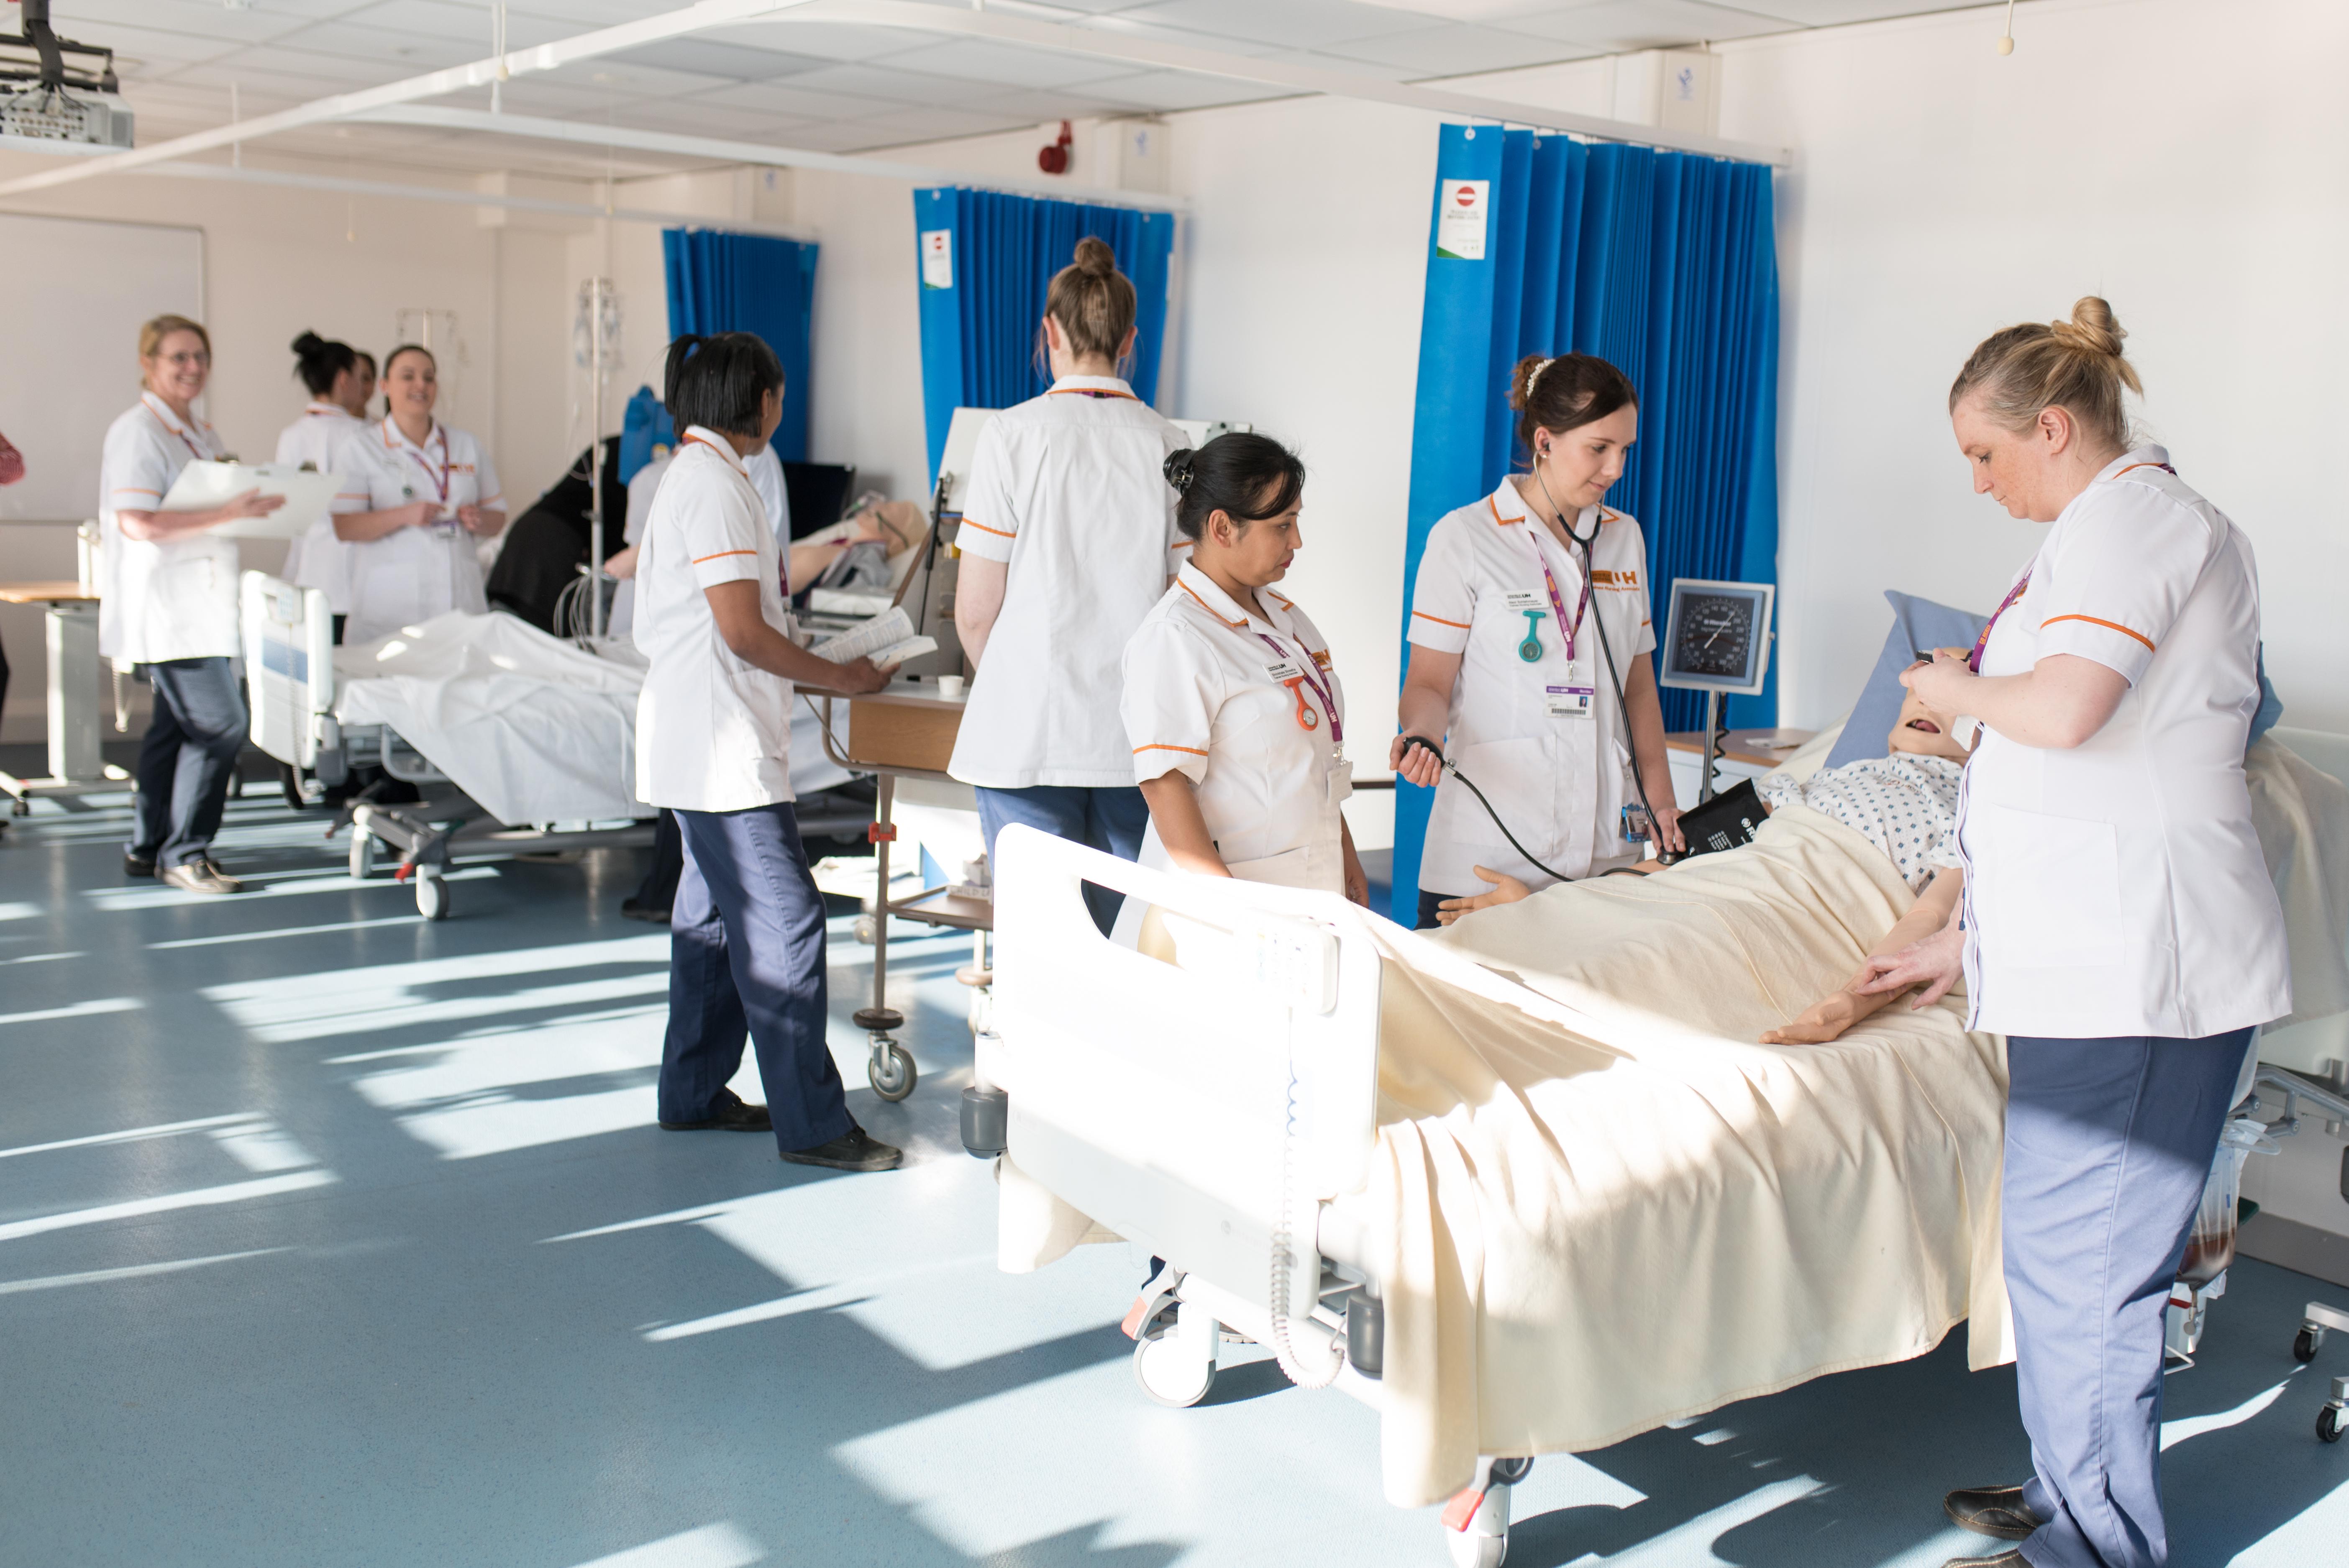 Nursing associates in training in a ward